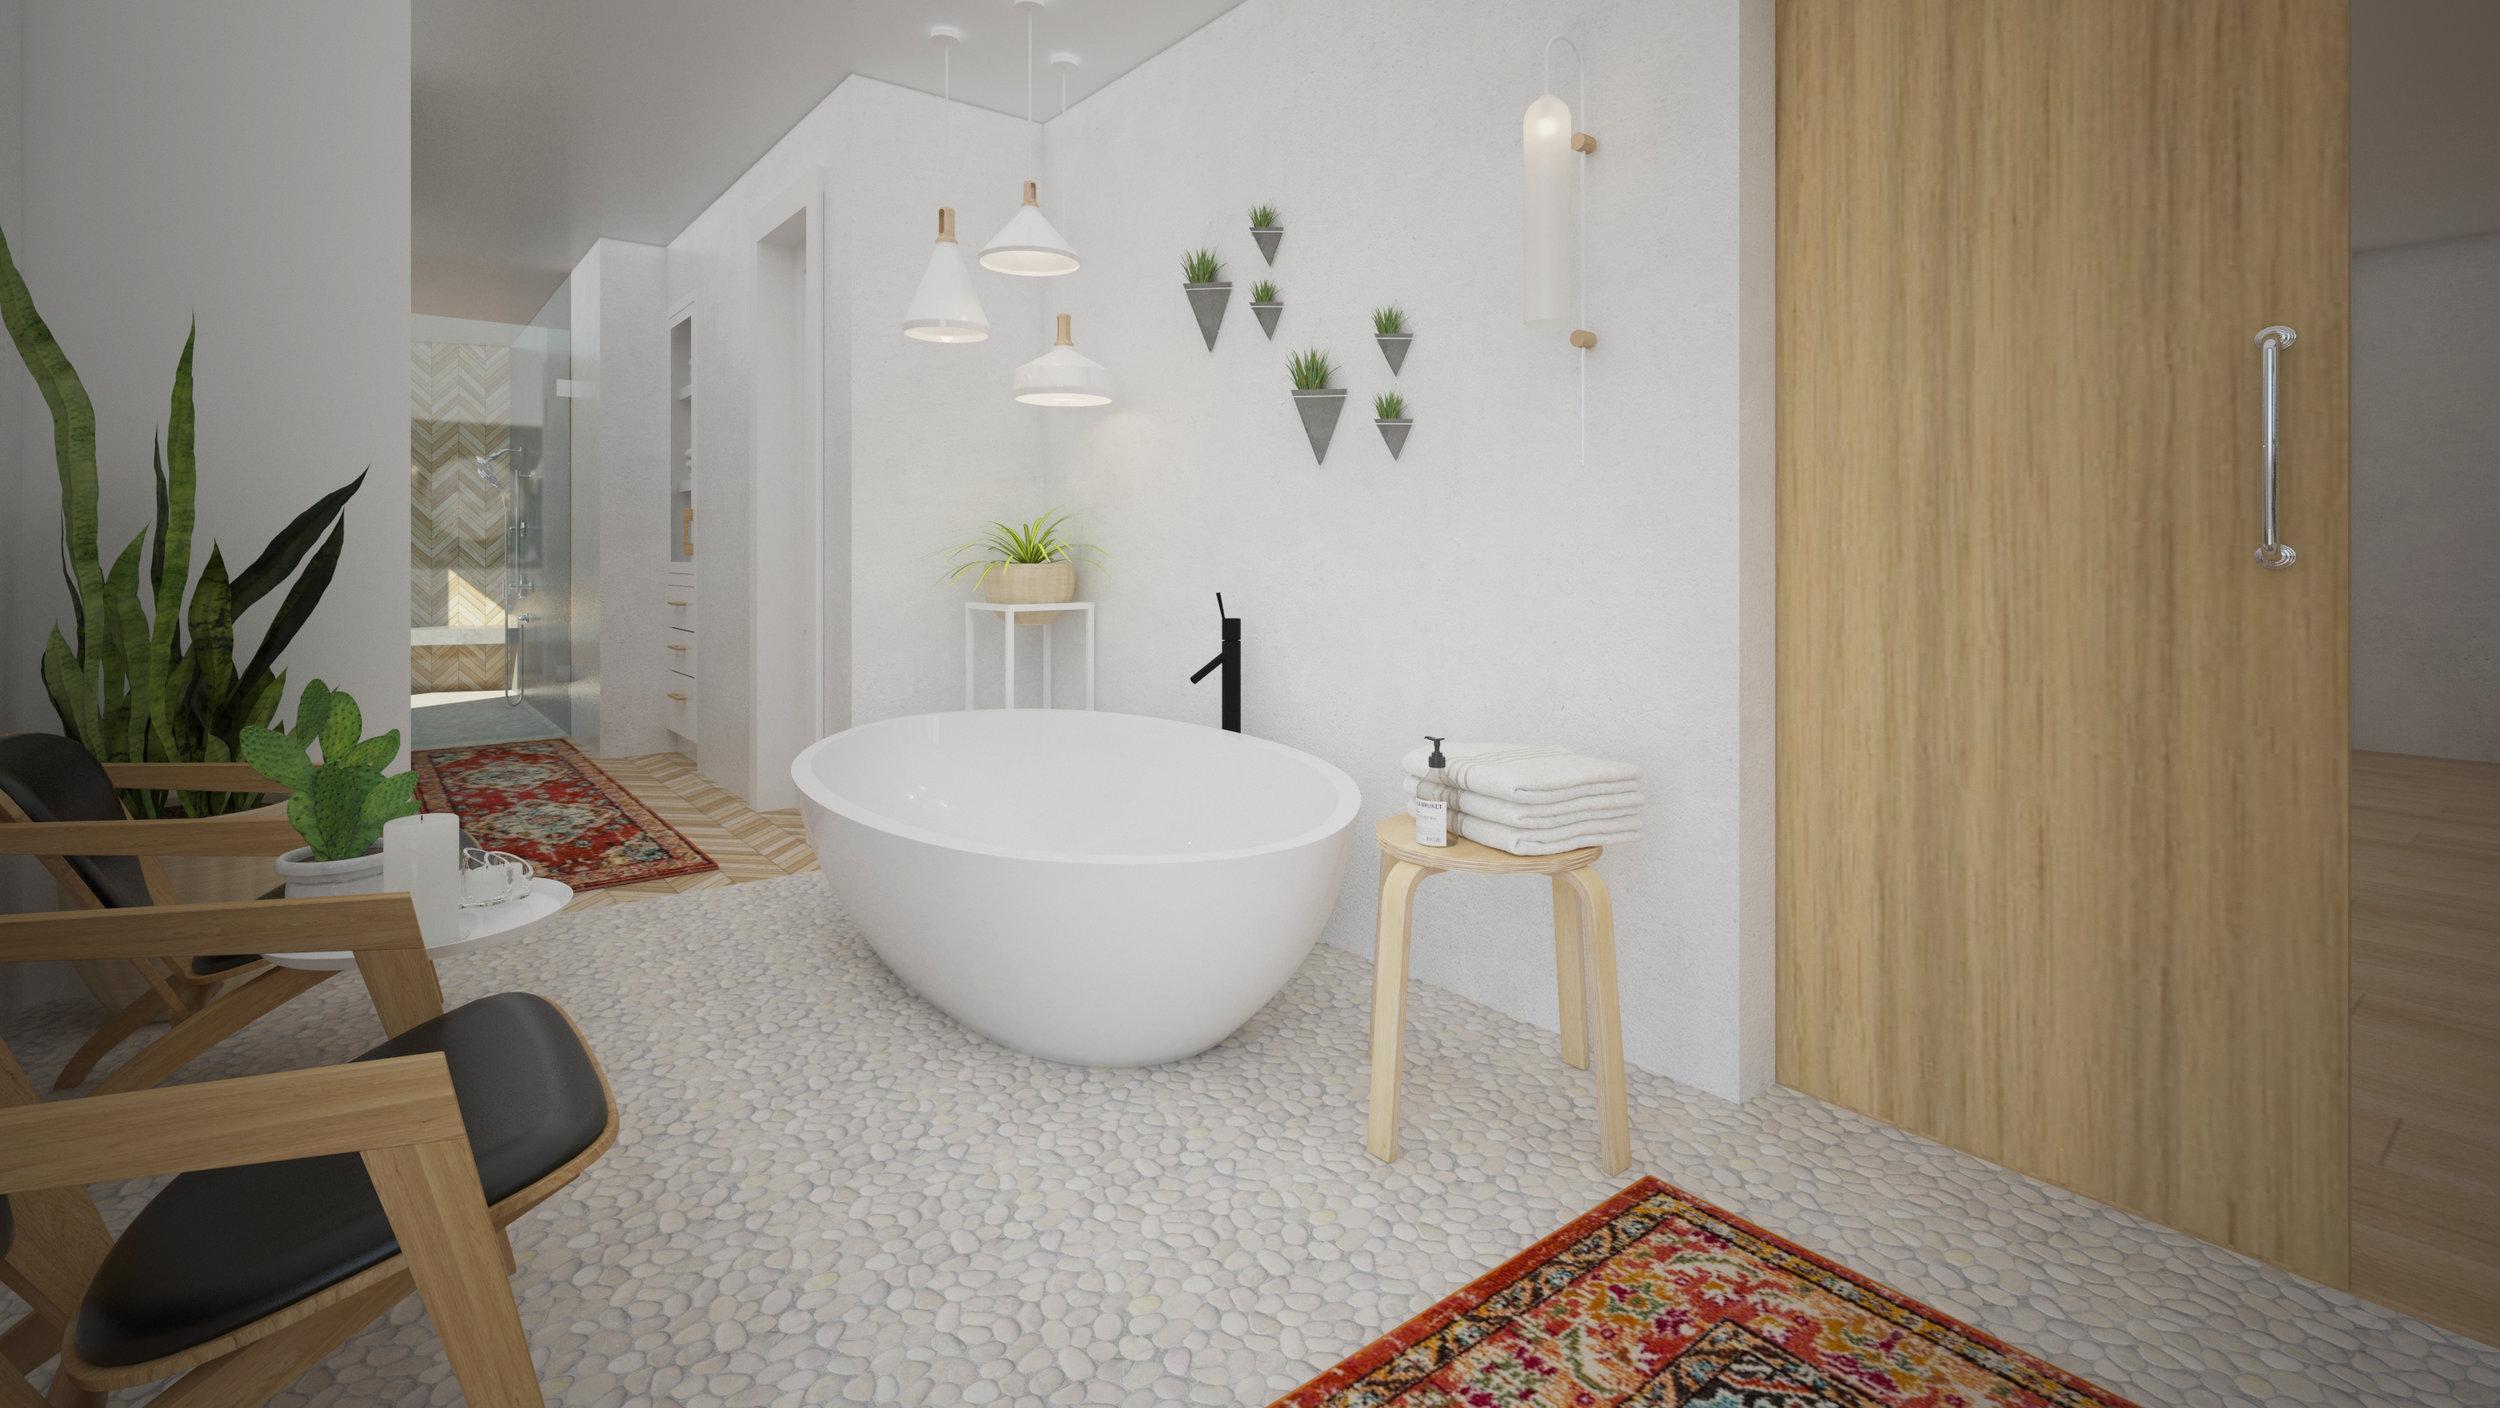 Master Bath Remodel Rendering by Dina Marie Joy Designs